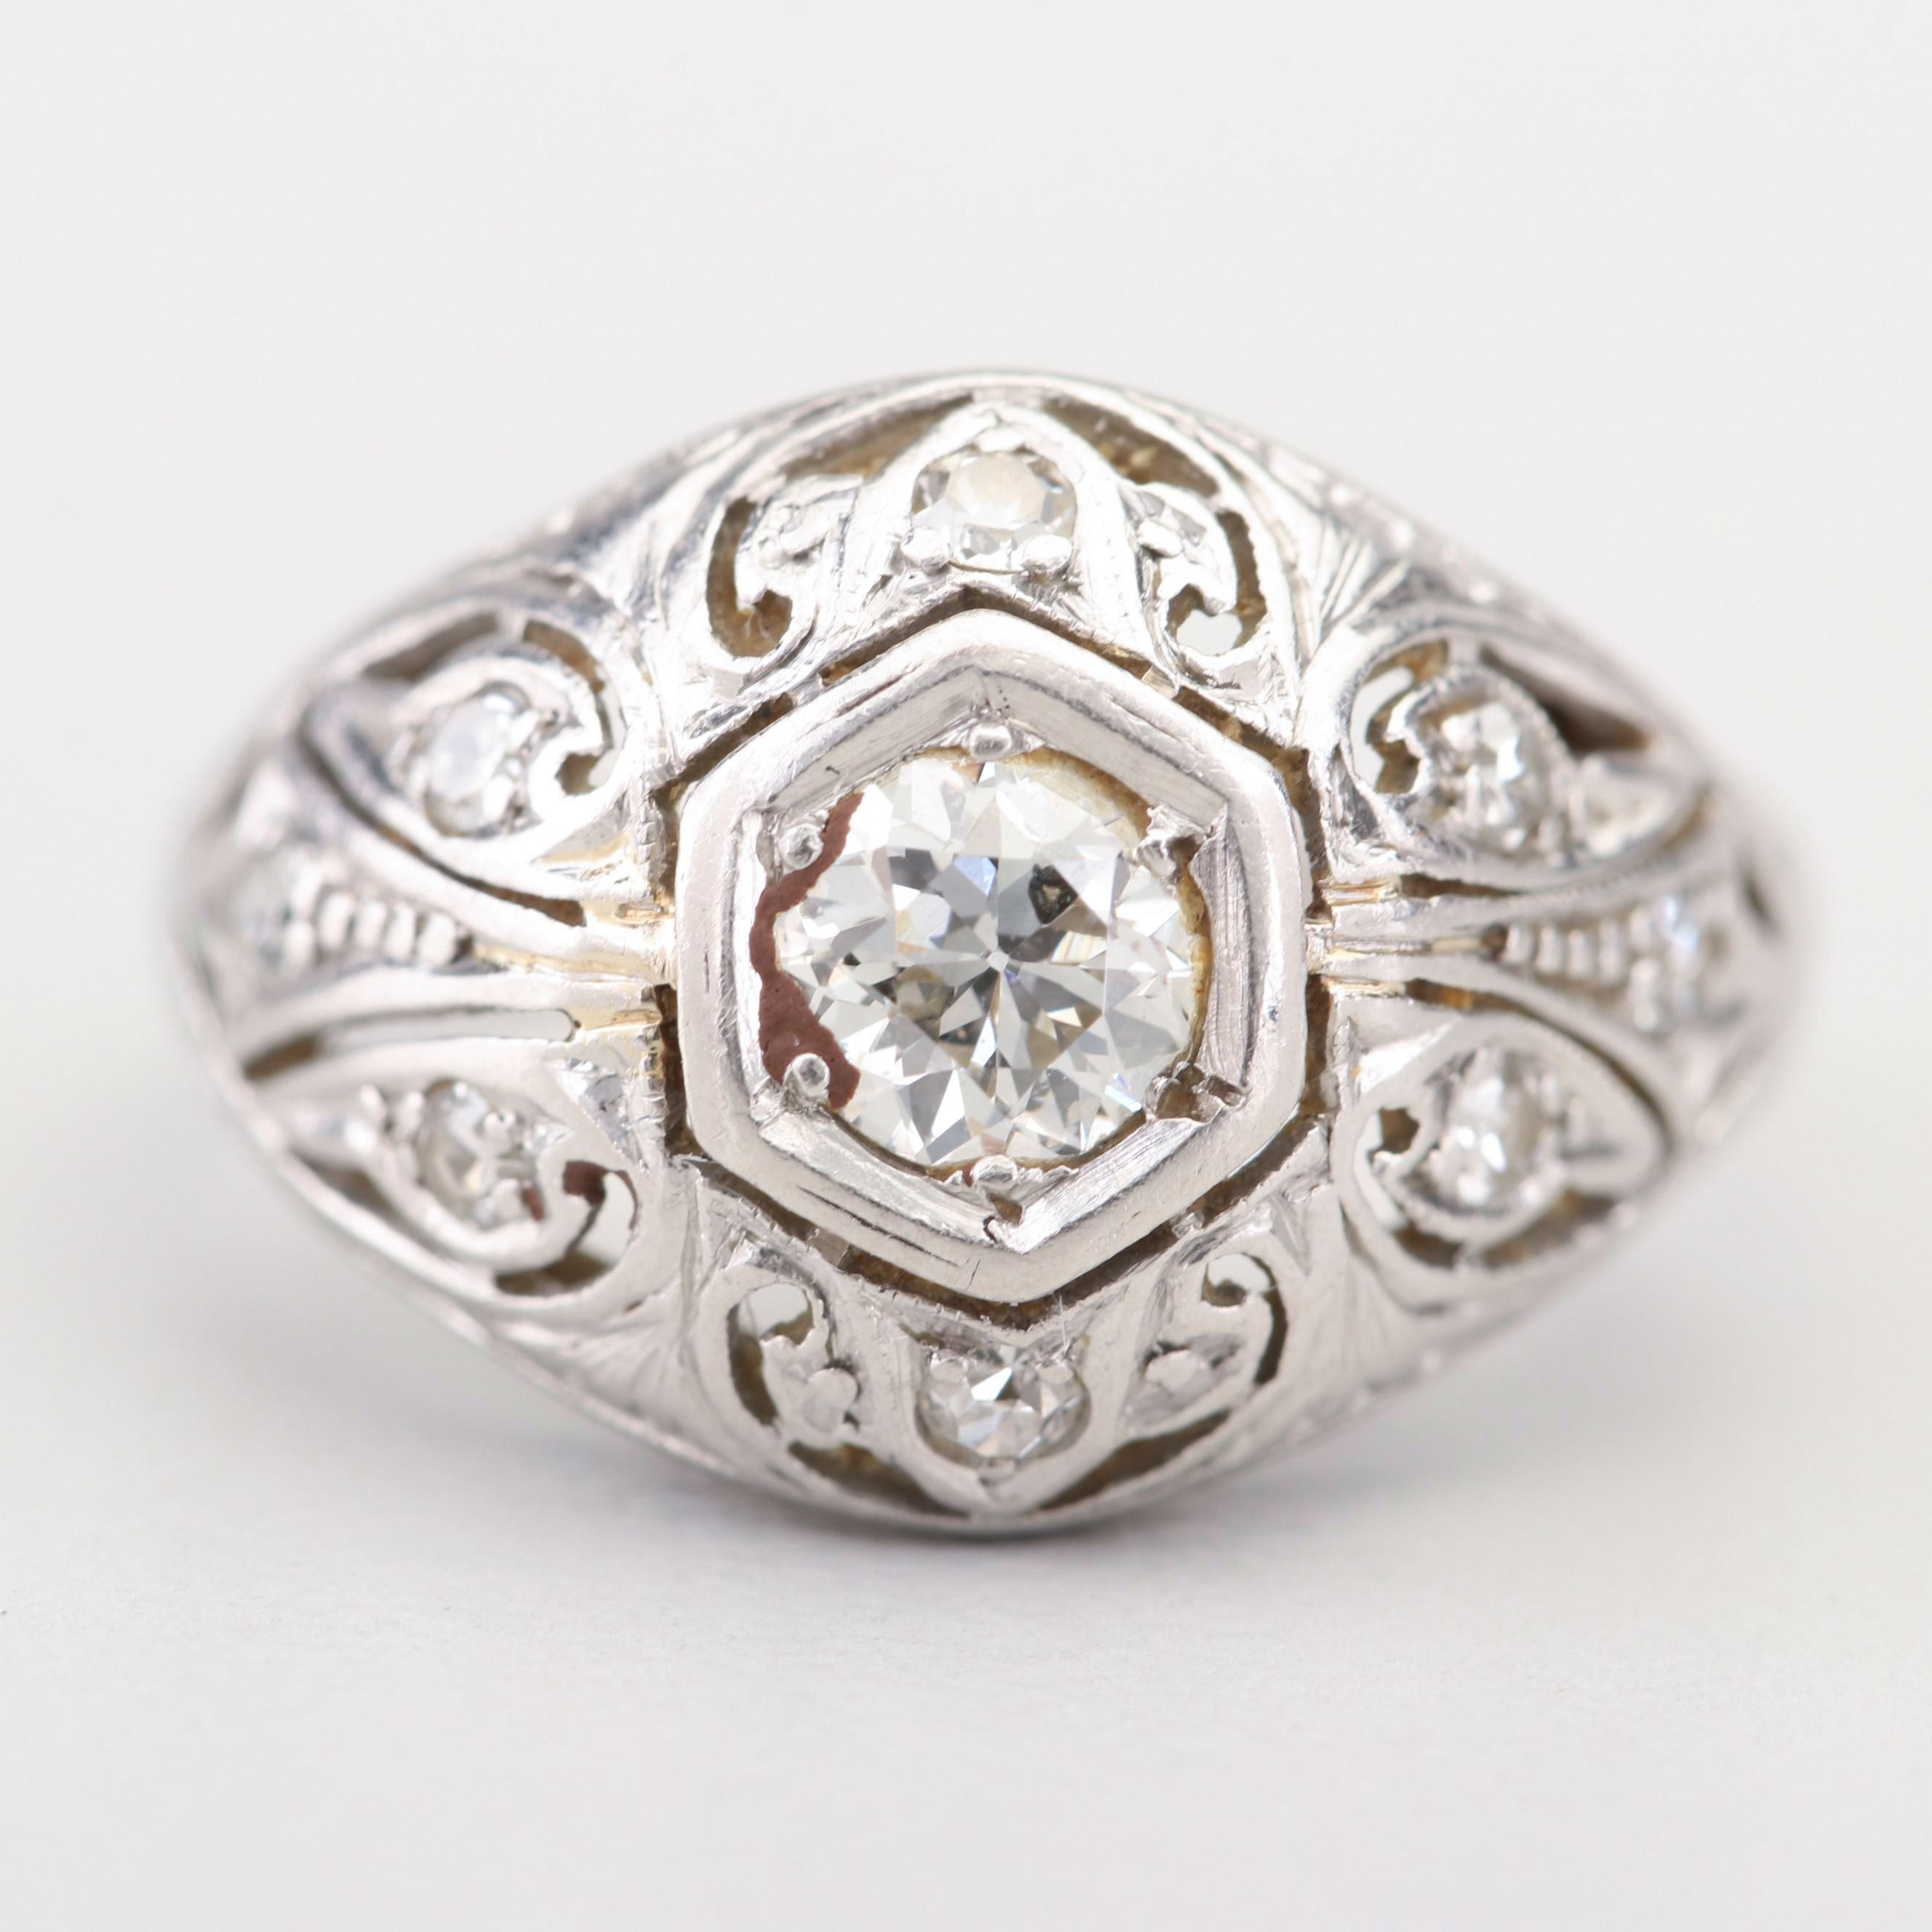 Antique Platinum Old European Cut and Single Cut Diamond Ring